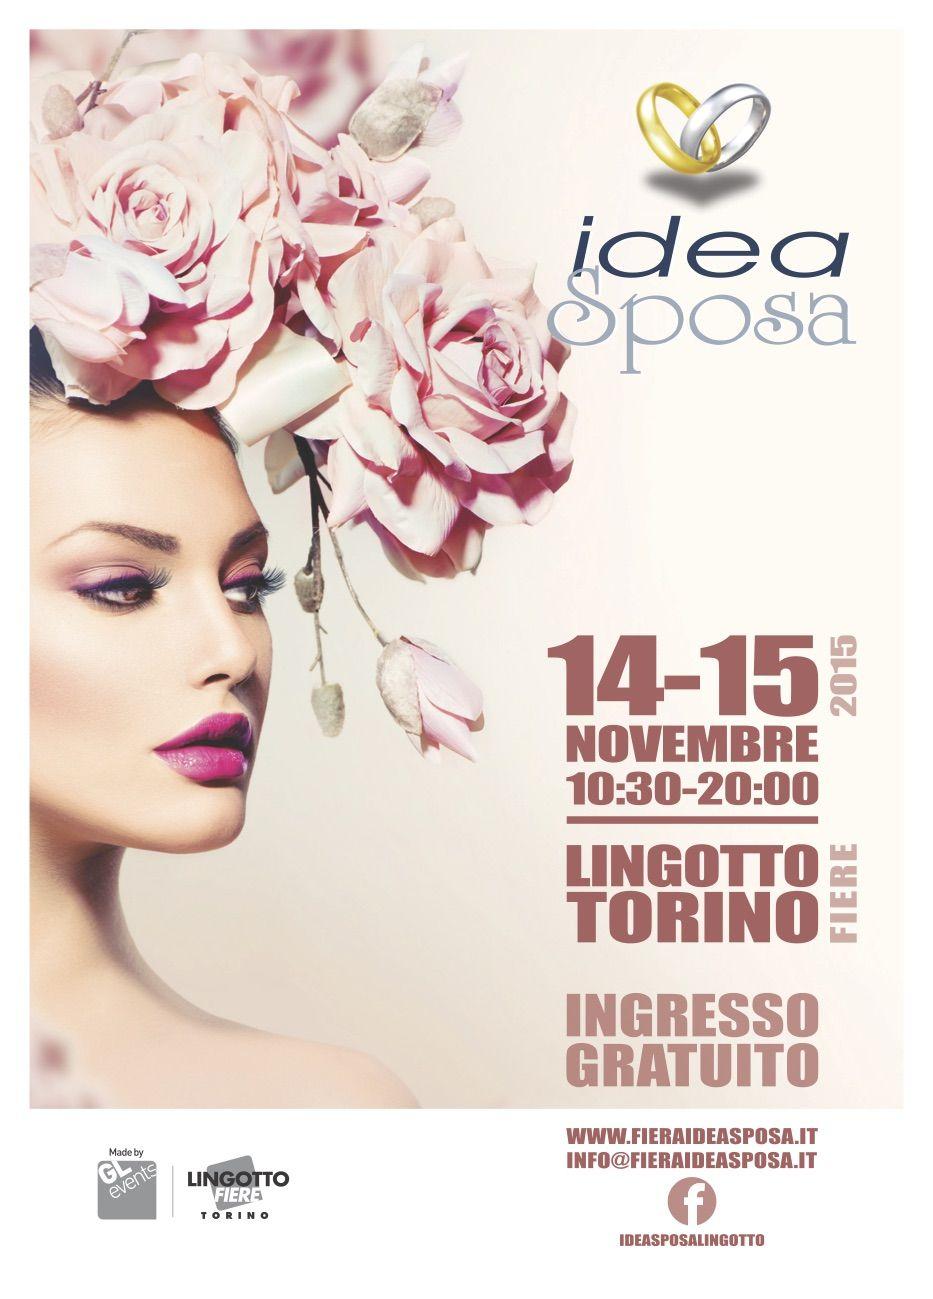 Idea Sposa, 14-15 novembre 2015 @ Lingotto Fiere-Torino, www.fieraideasposa.it #fieraideasposa #lingottofiere #torino #matrimonio #nozze #wedding #marsala #pantone